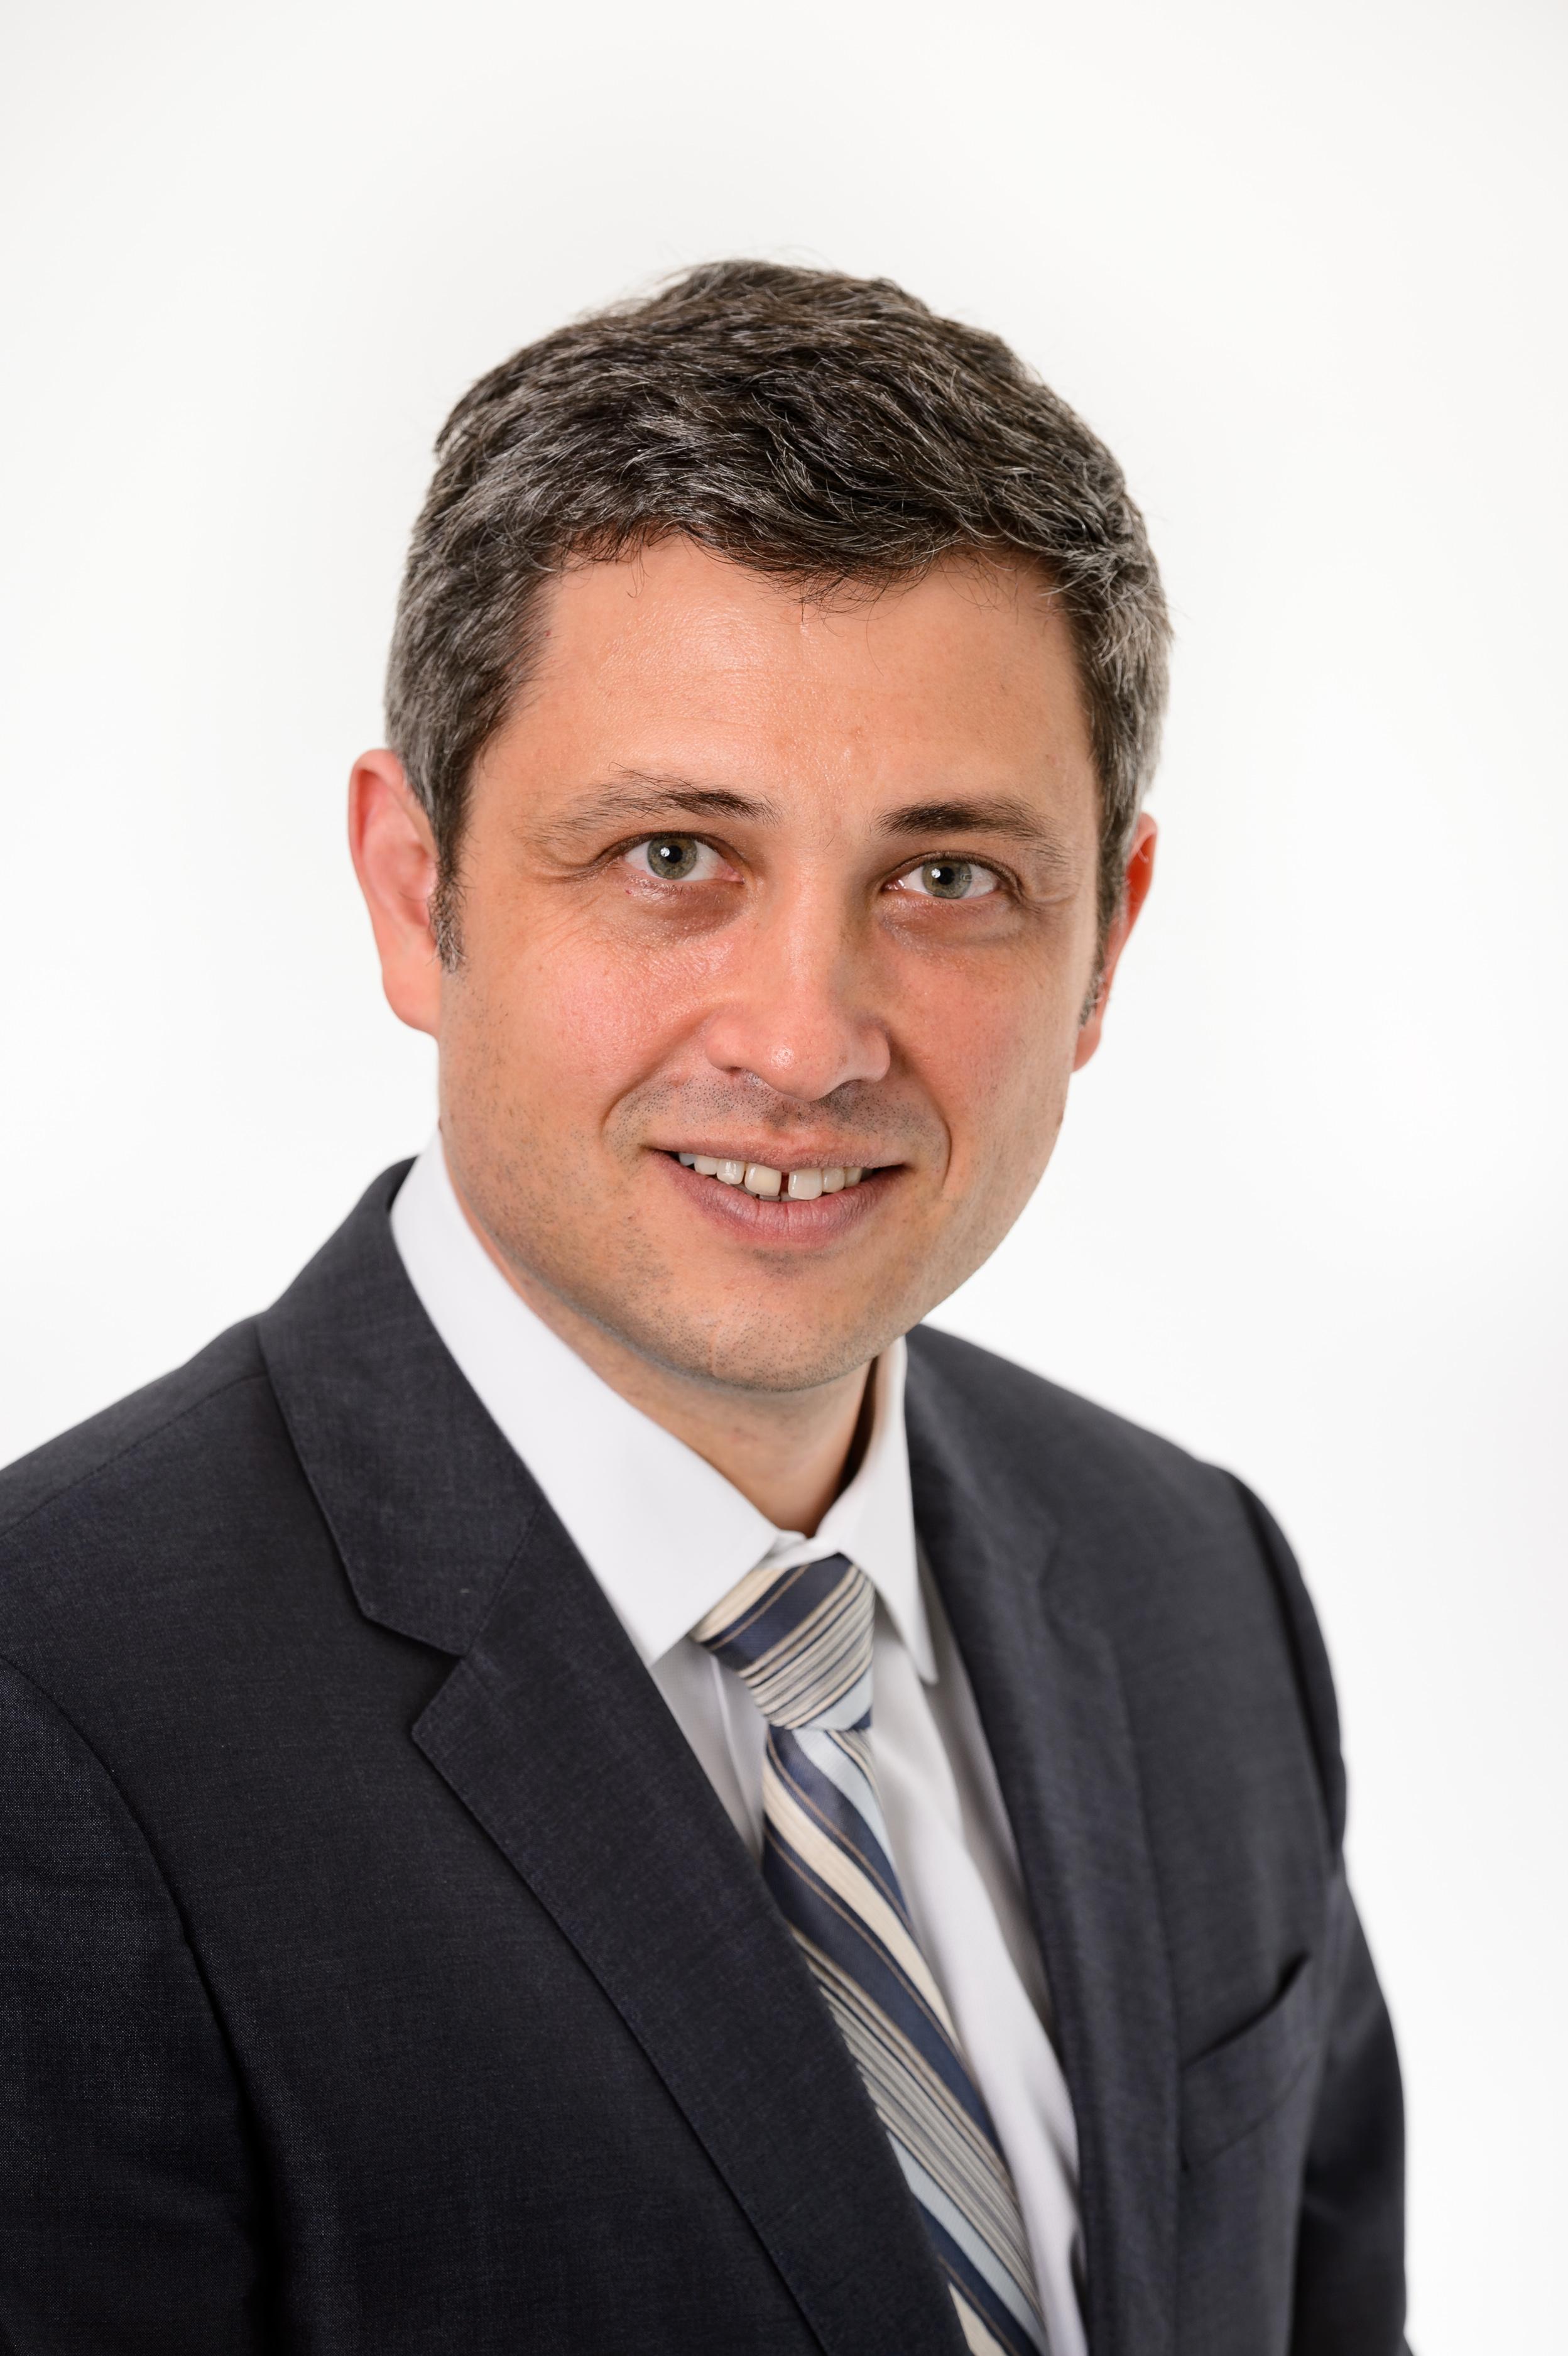 Dr Daniel Novakovic   FRACS, MPH, MBBS(Syd), BSc